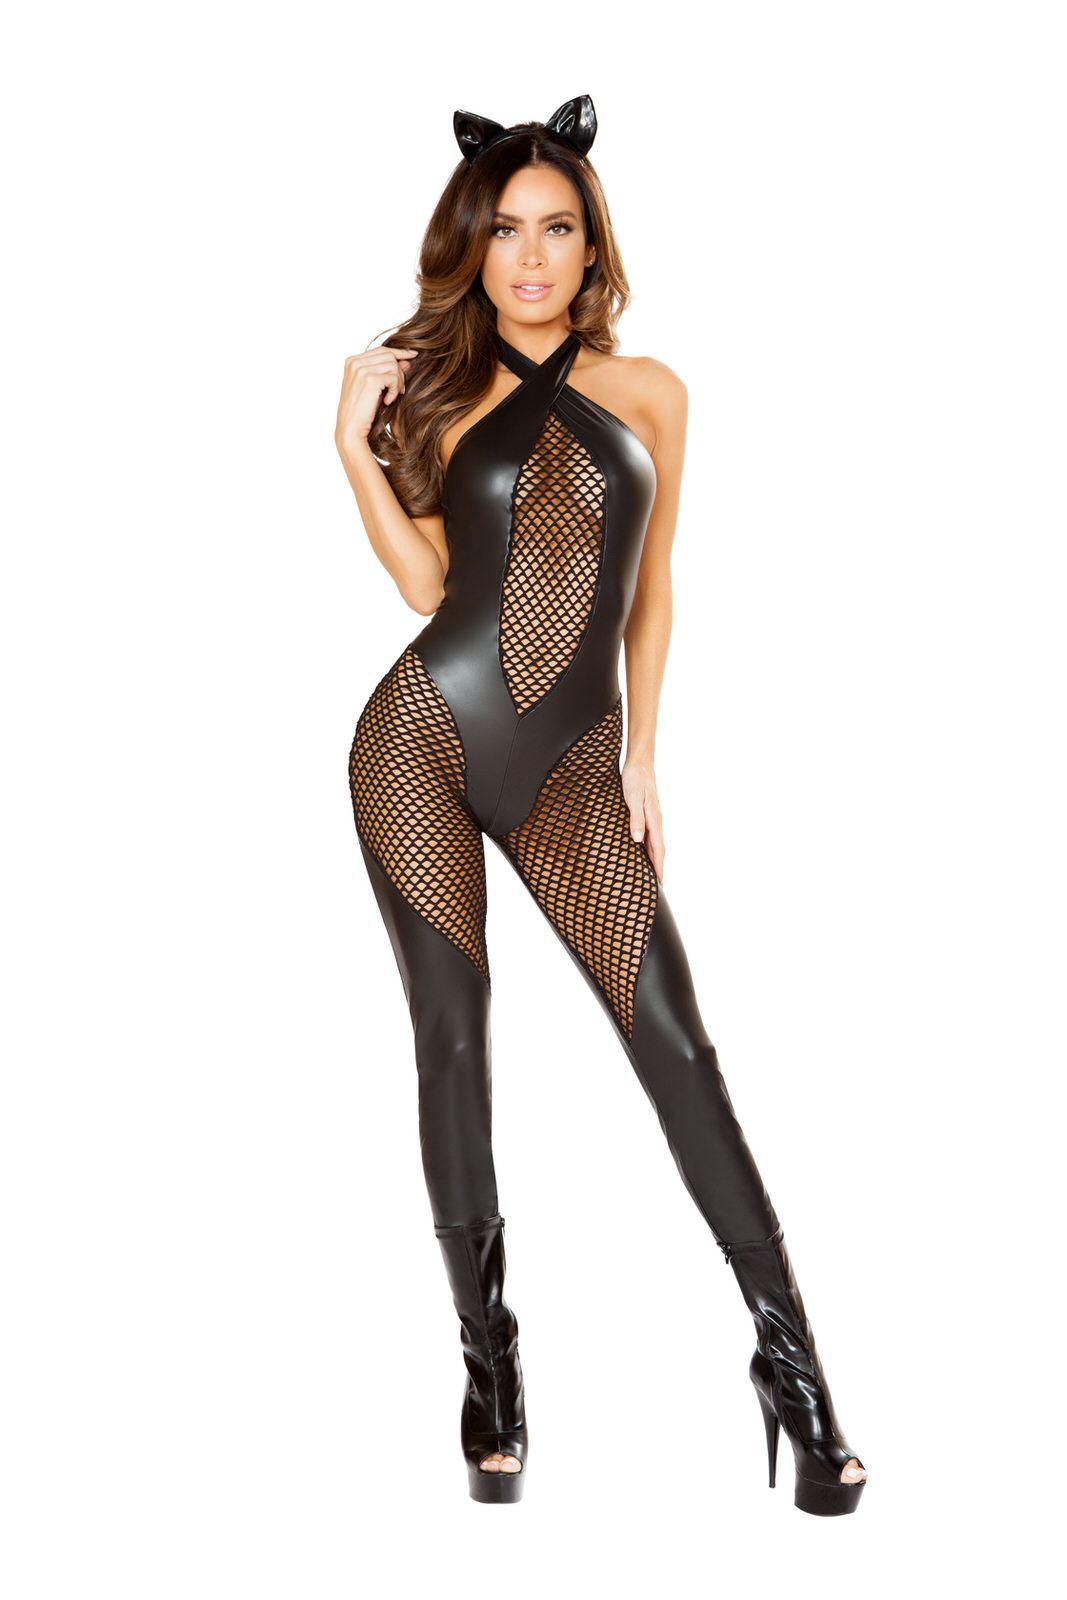 naughty girls in halloween costumes nude